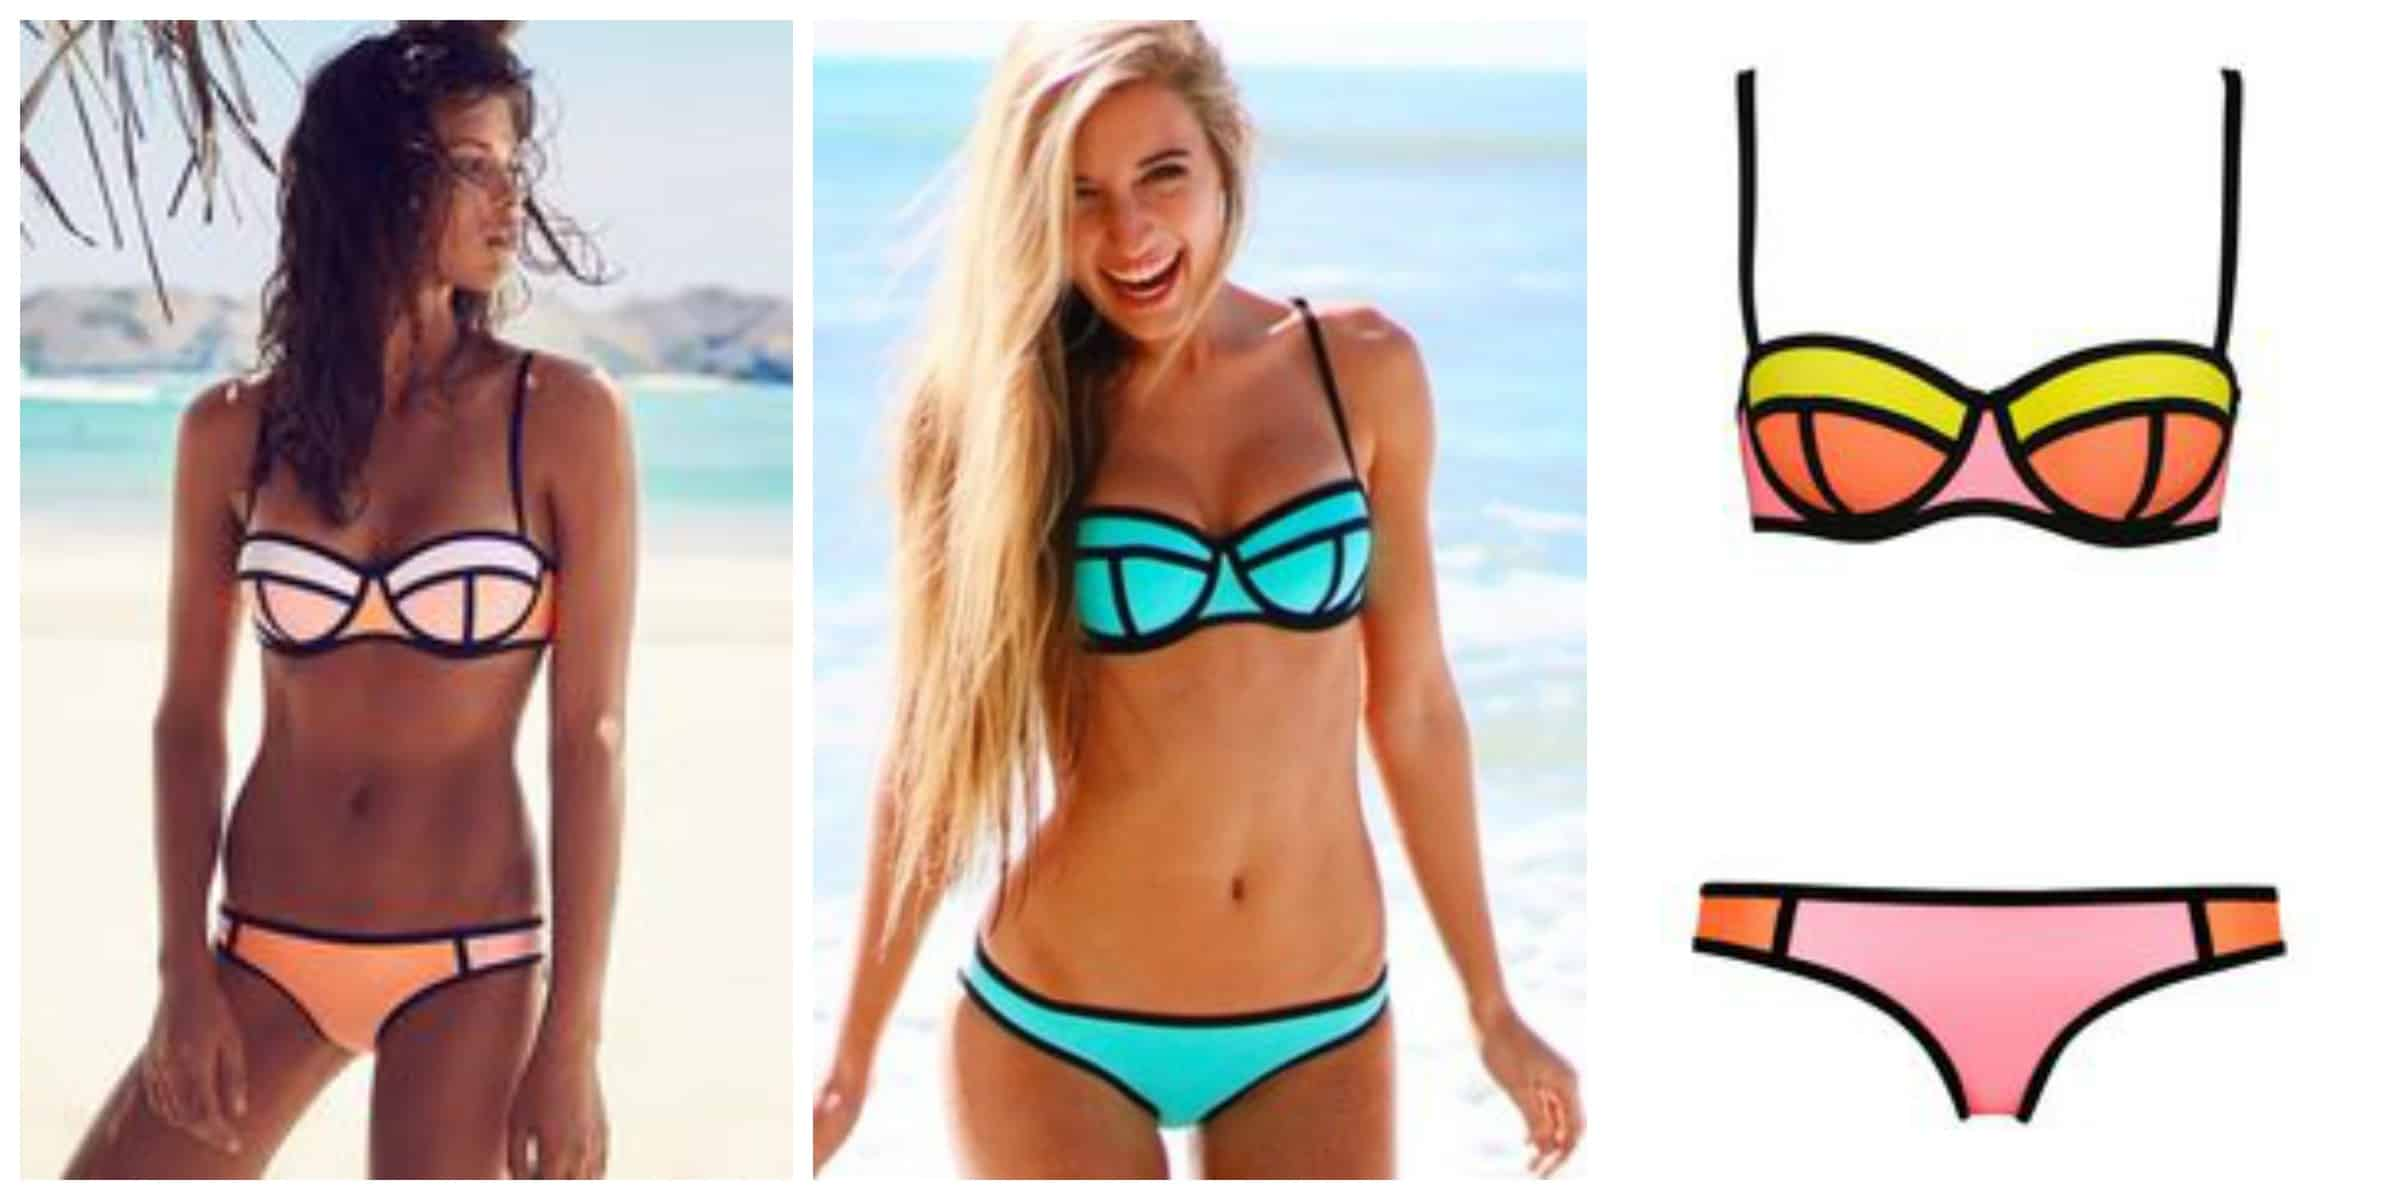 How To Pick A Flattering Bikini! A Bikini For Your Body Type